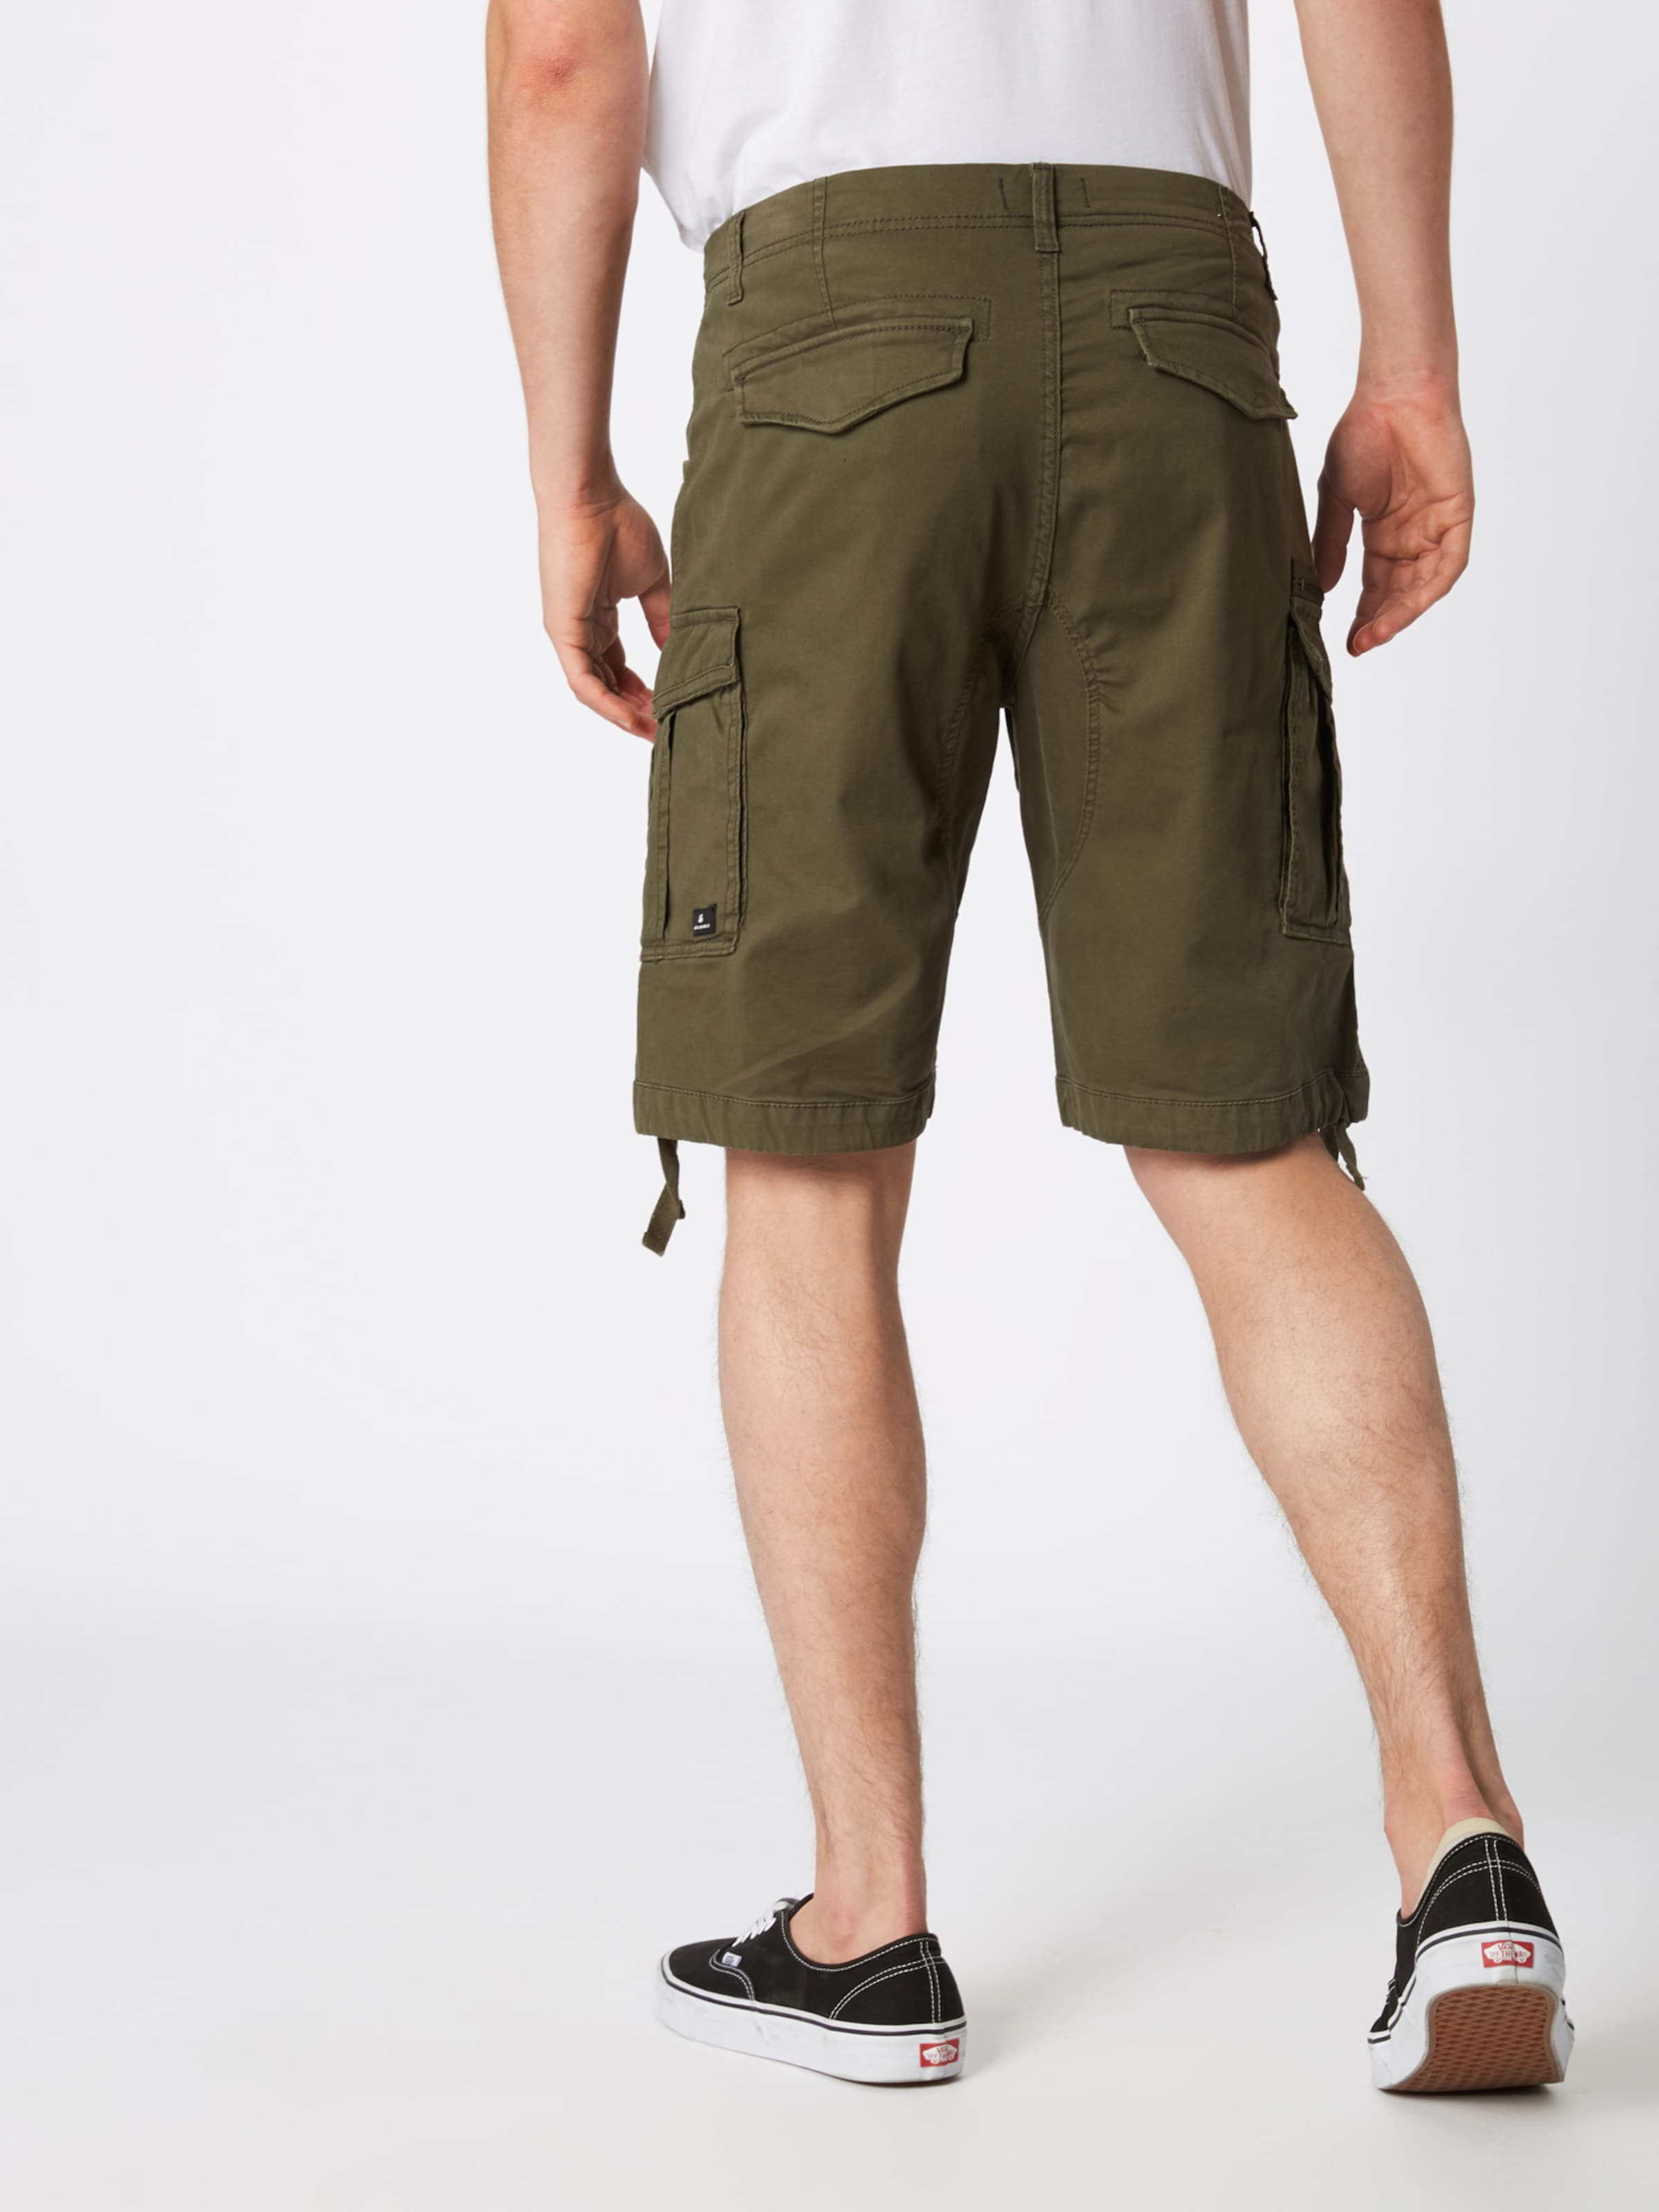 Jones En Noir Jackamp; Cargo Pantalon DYEeH2IW9